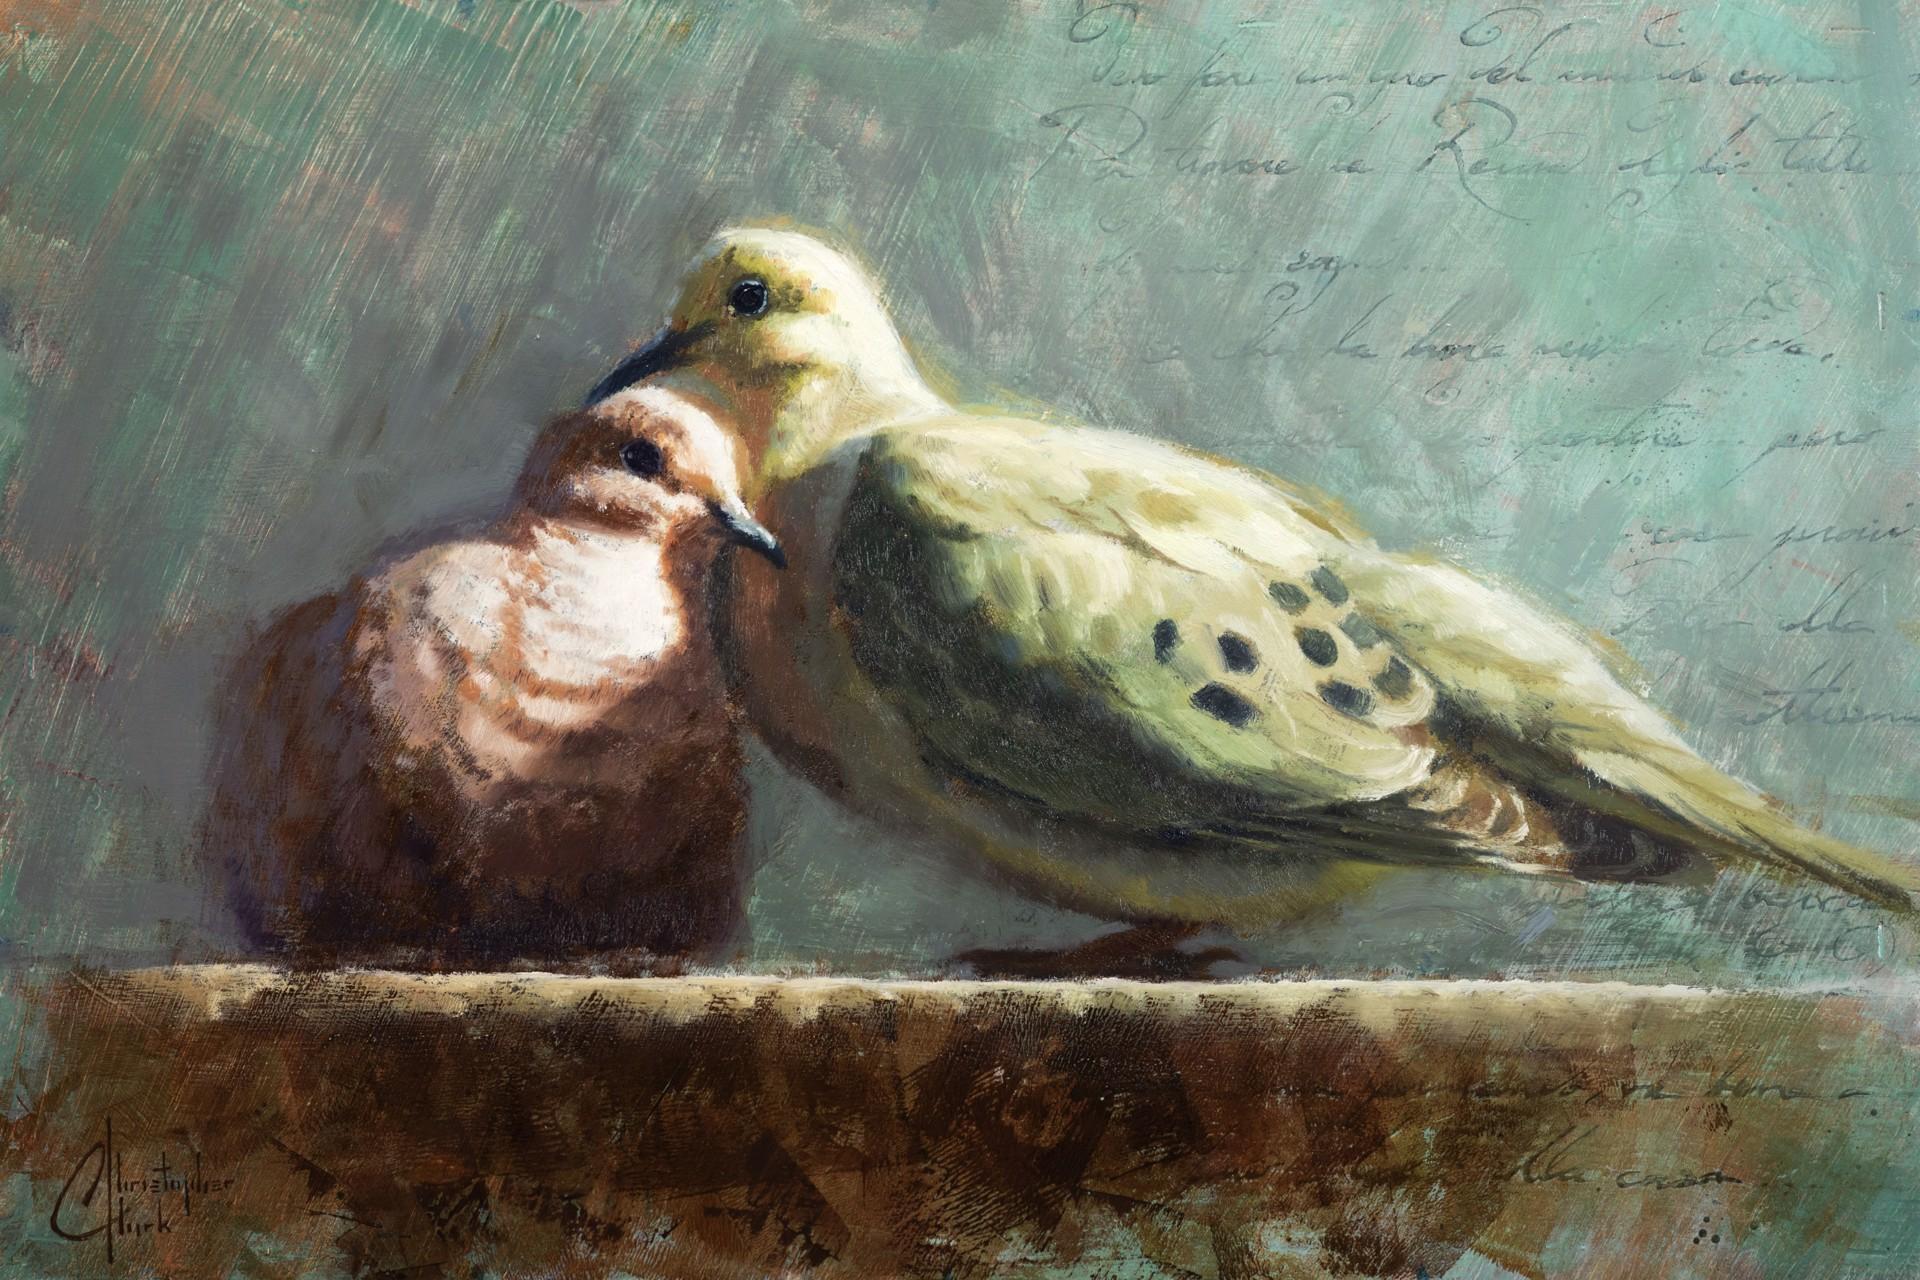 Doves in Love by Christopher Clark